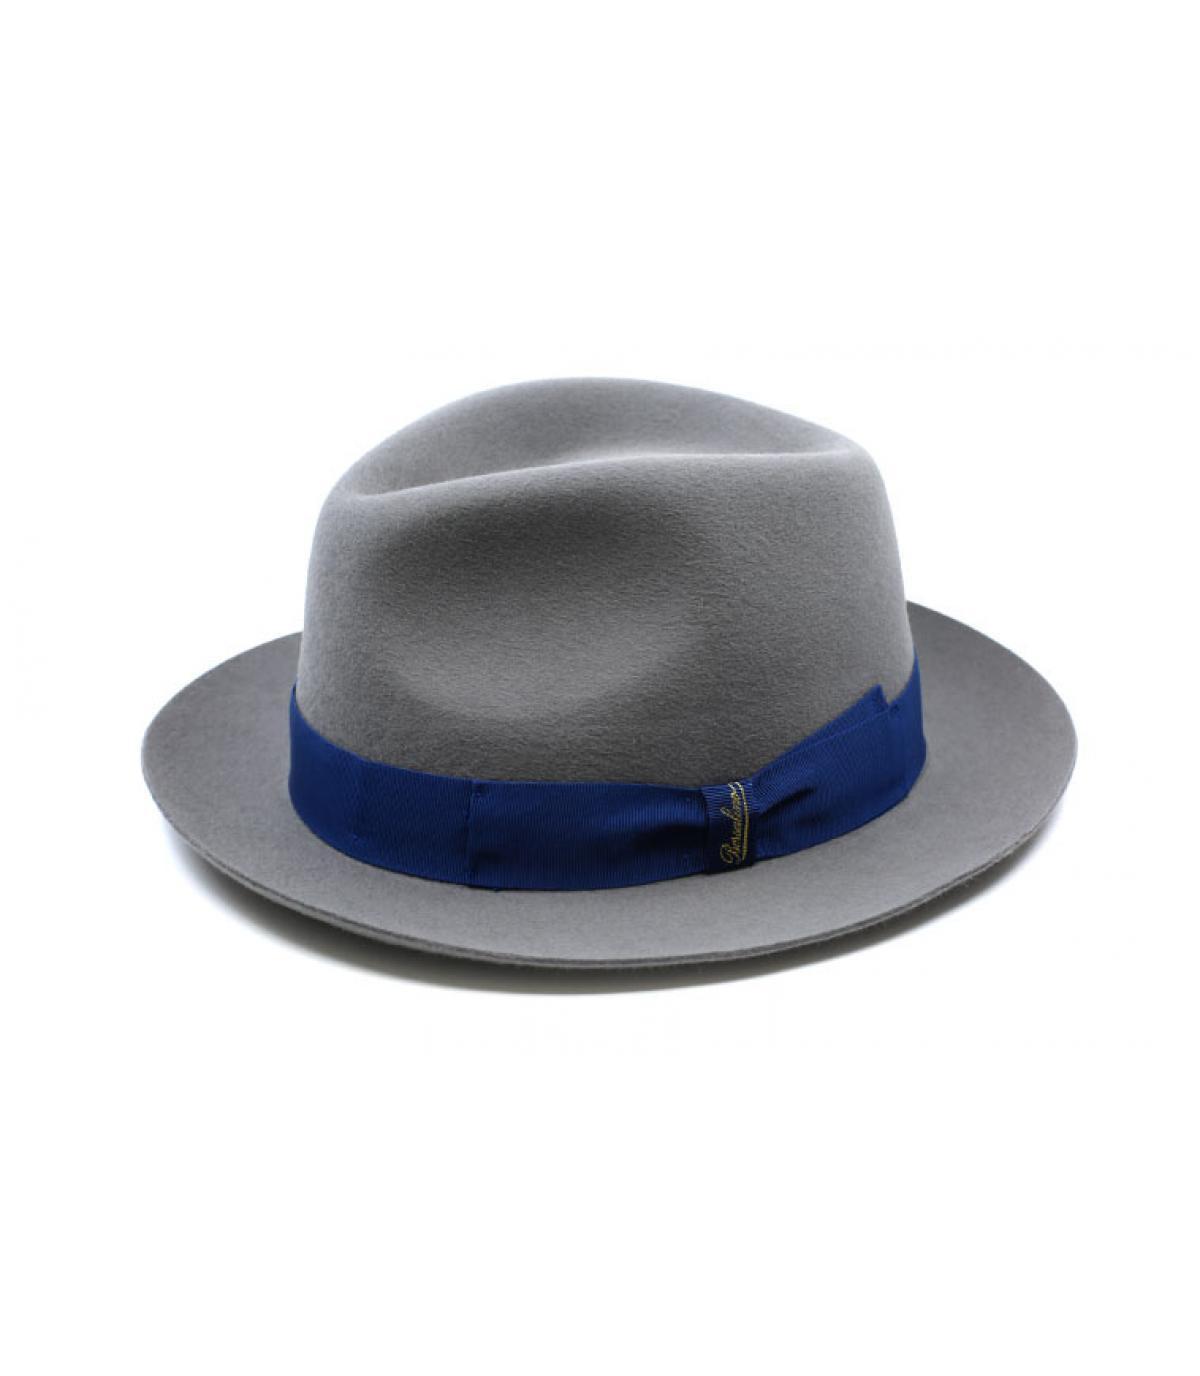 Detalles Grey Fur Felt Hat imagen 4